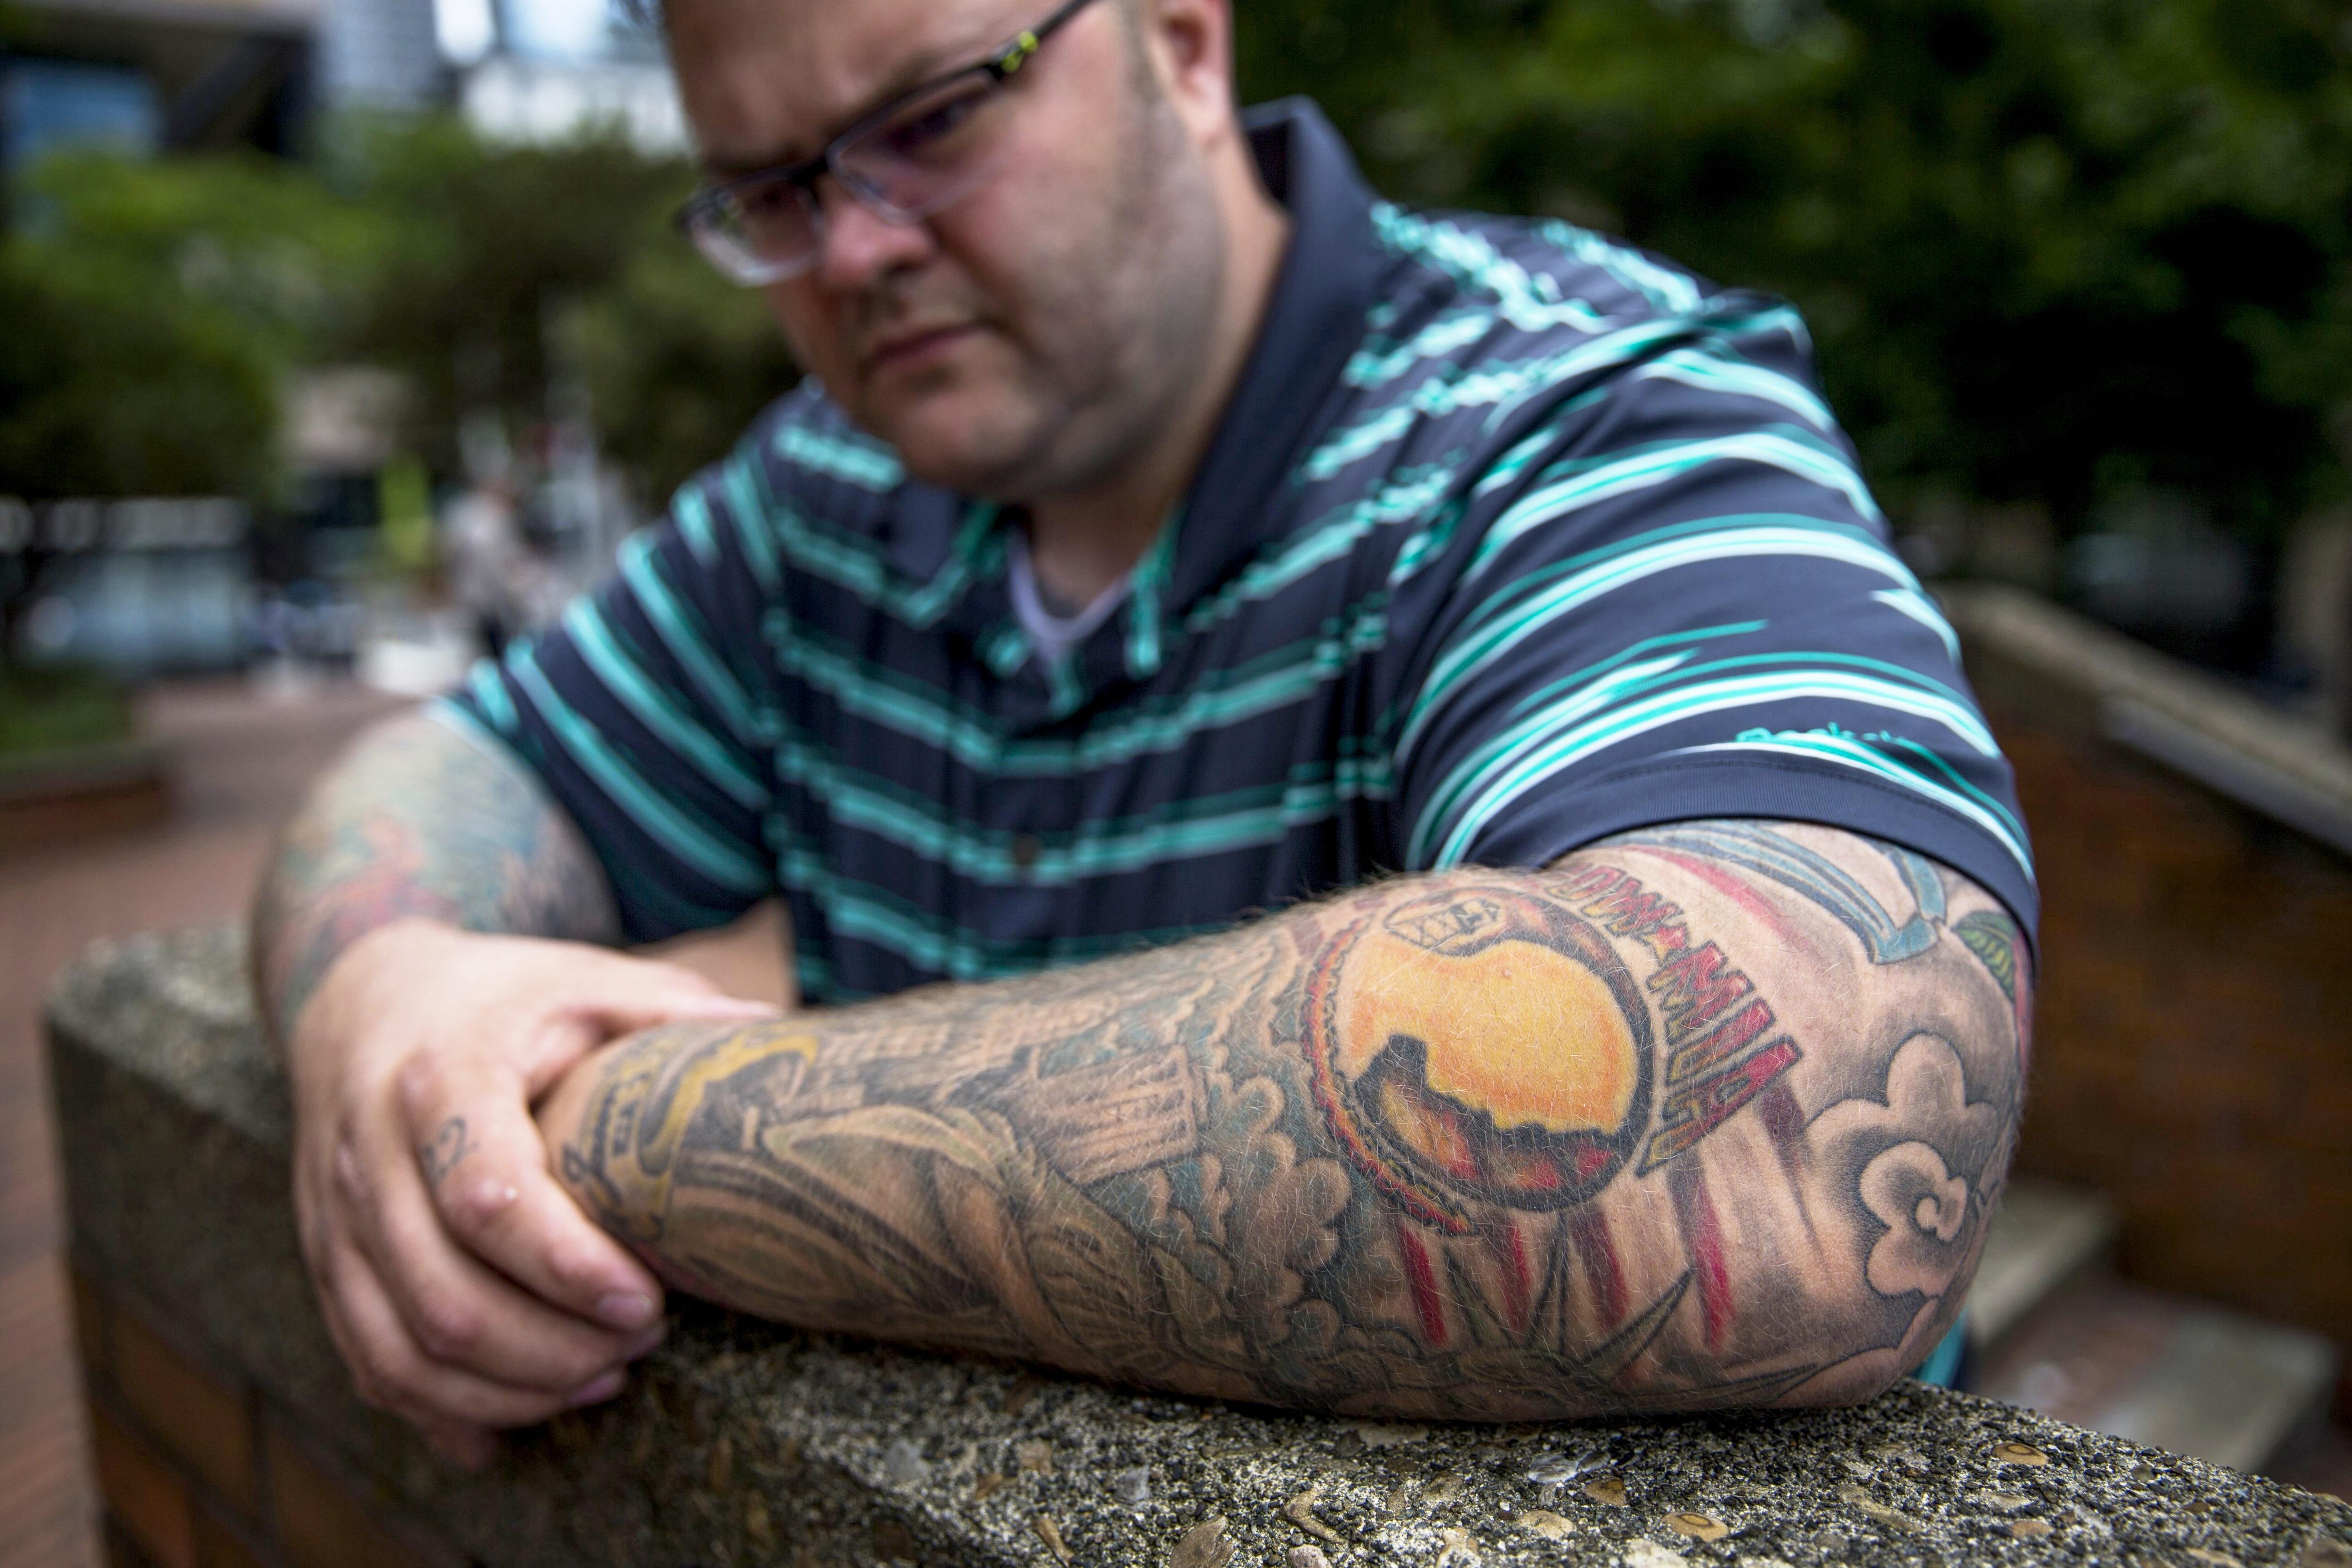 Veterans Tattoos Symbolize Loss Service And Patriotism